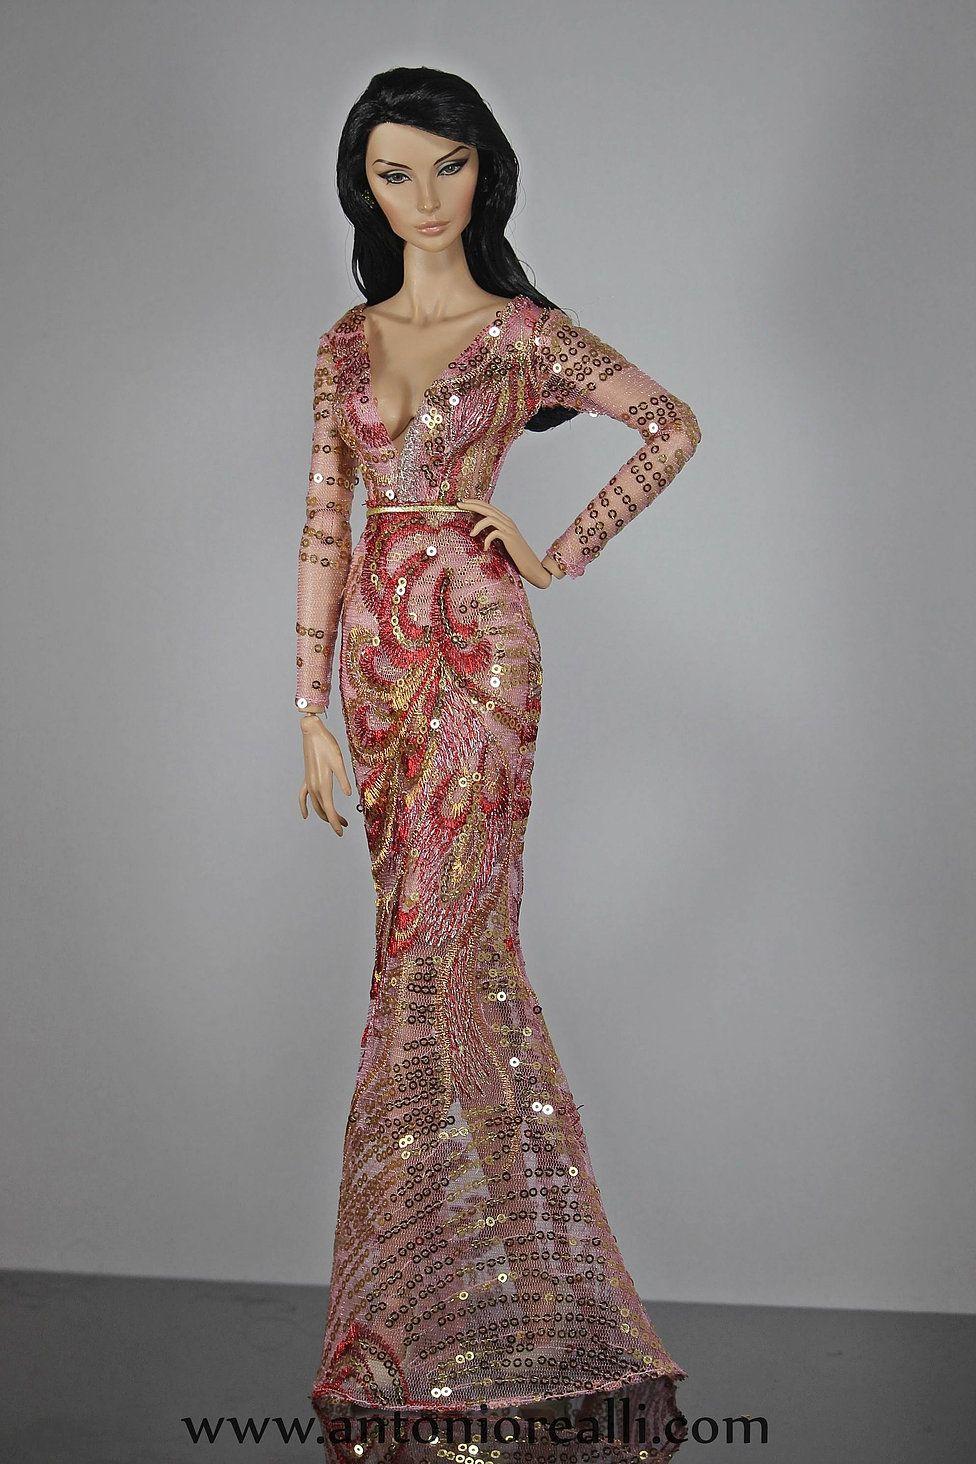 fashion for dolls antonio realli | Barbie Evening Gowns 3 ...